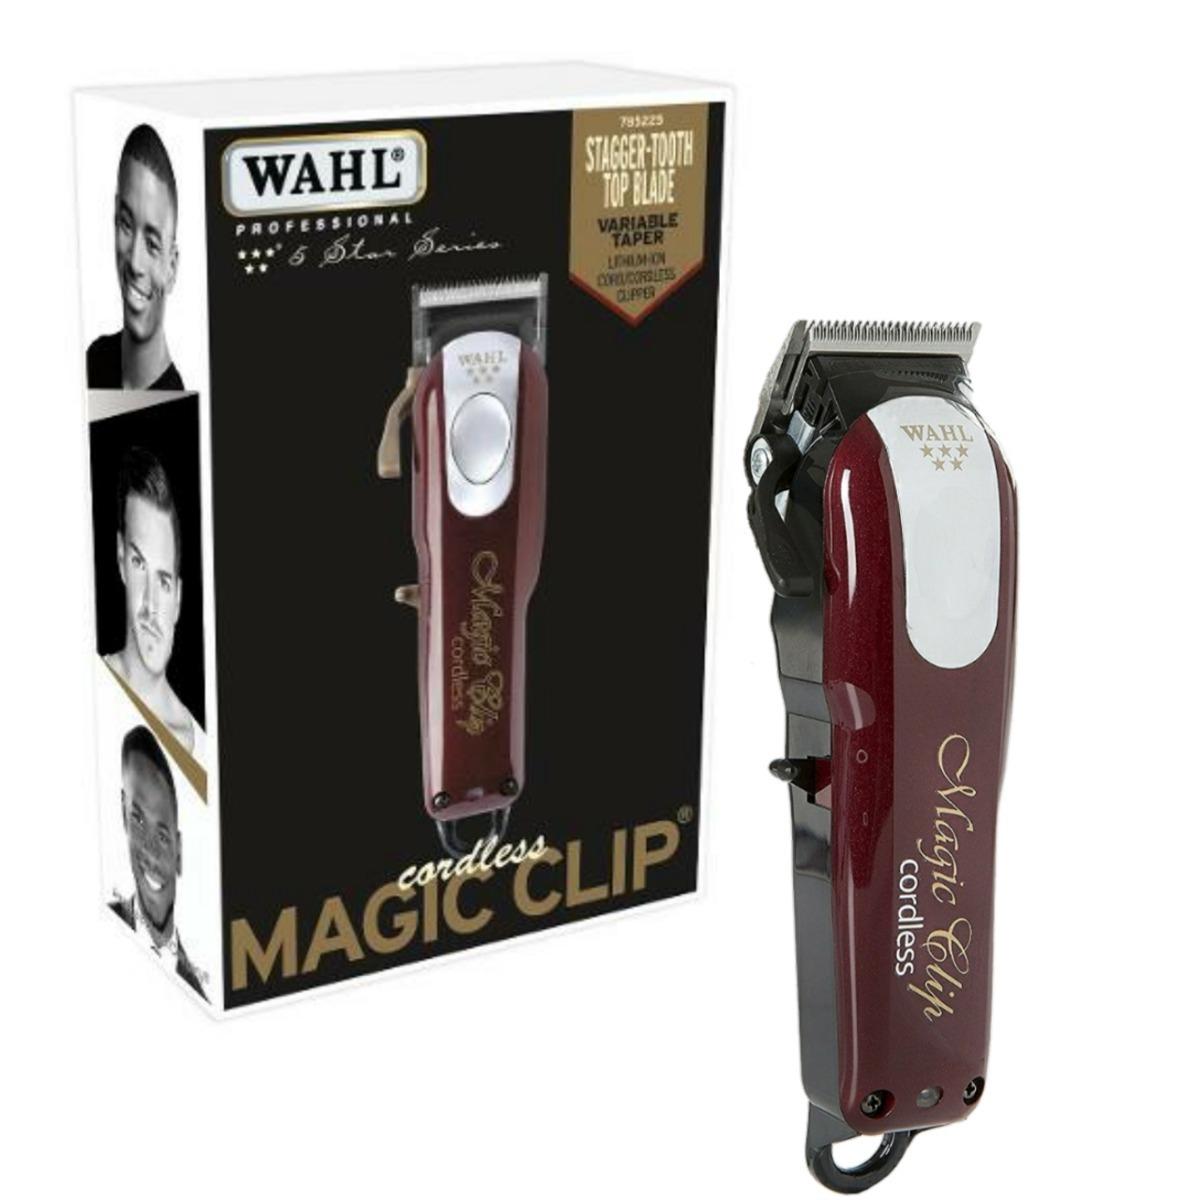 593917a10 Magic Clip Cordless Envios Imediatos Após Compra - R$ 562,90 em Mercado  Livre